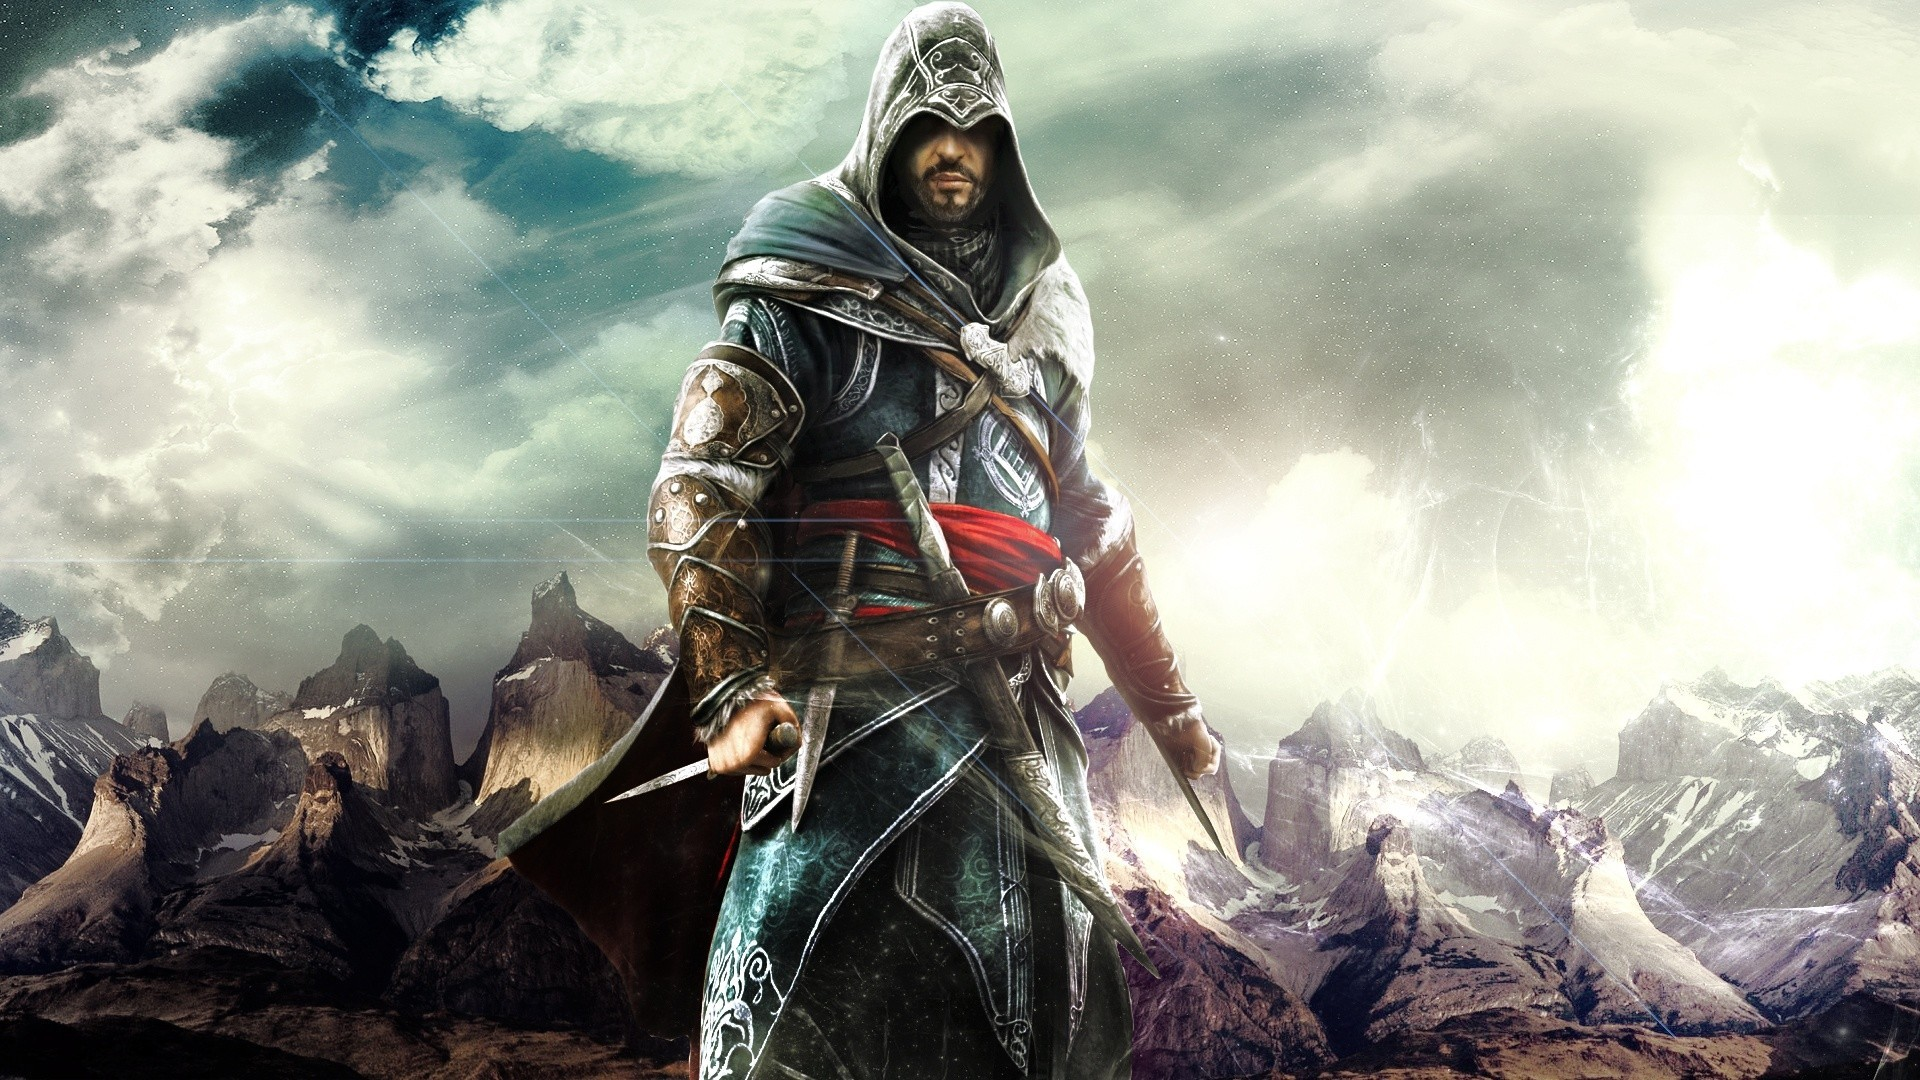 Epic Gaming Wallpaper (72+ images)